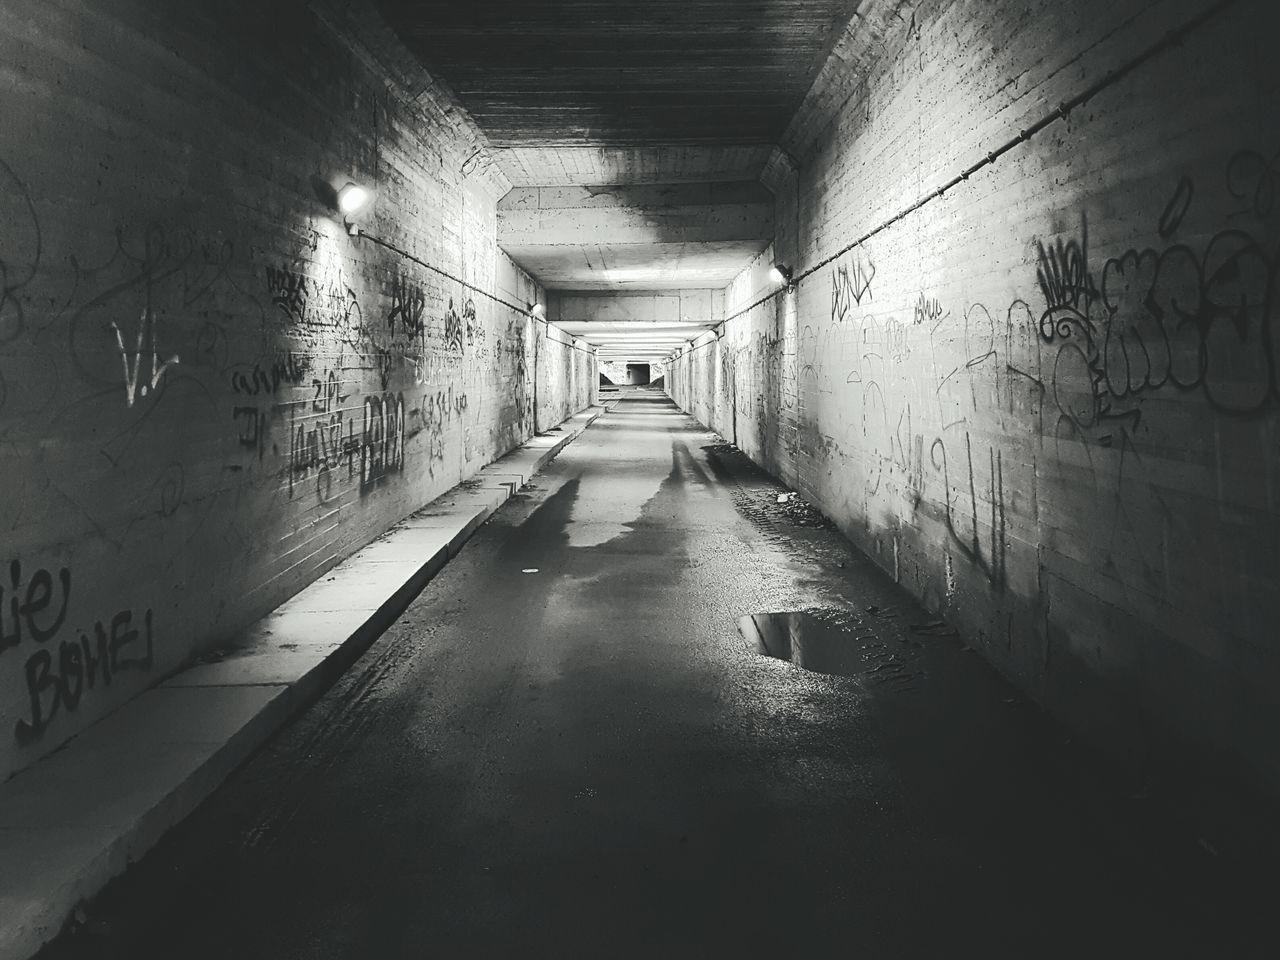 The Way Forward Indoors  Illuminated Tunnel No People Day Graffiti Art Graffiti Wall Underground Underground Walkway Blackandwhite Blackandwhite Photography Tags